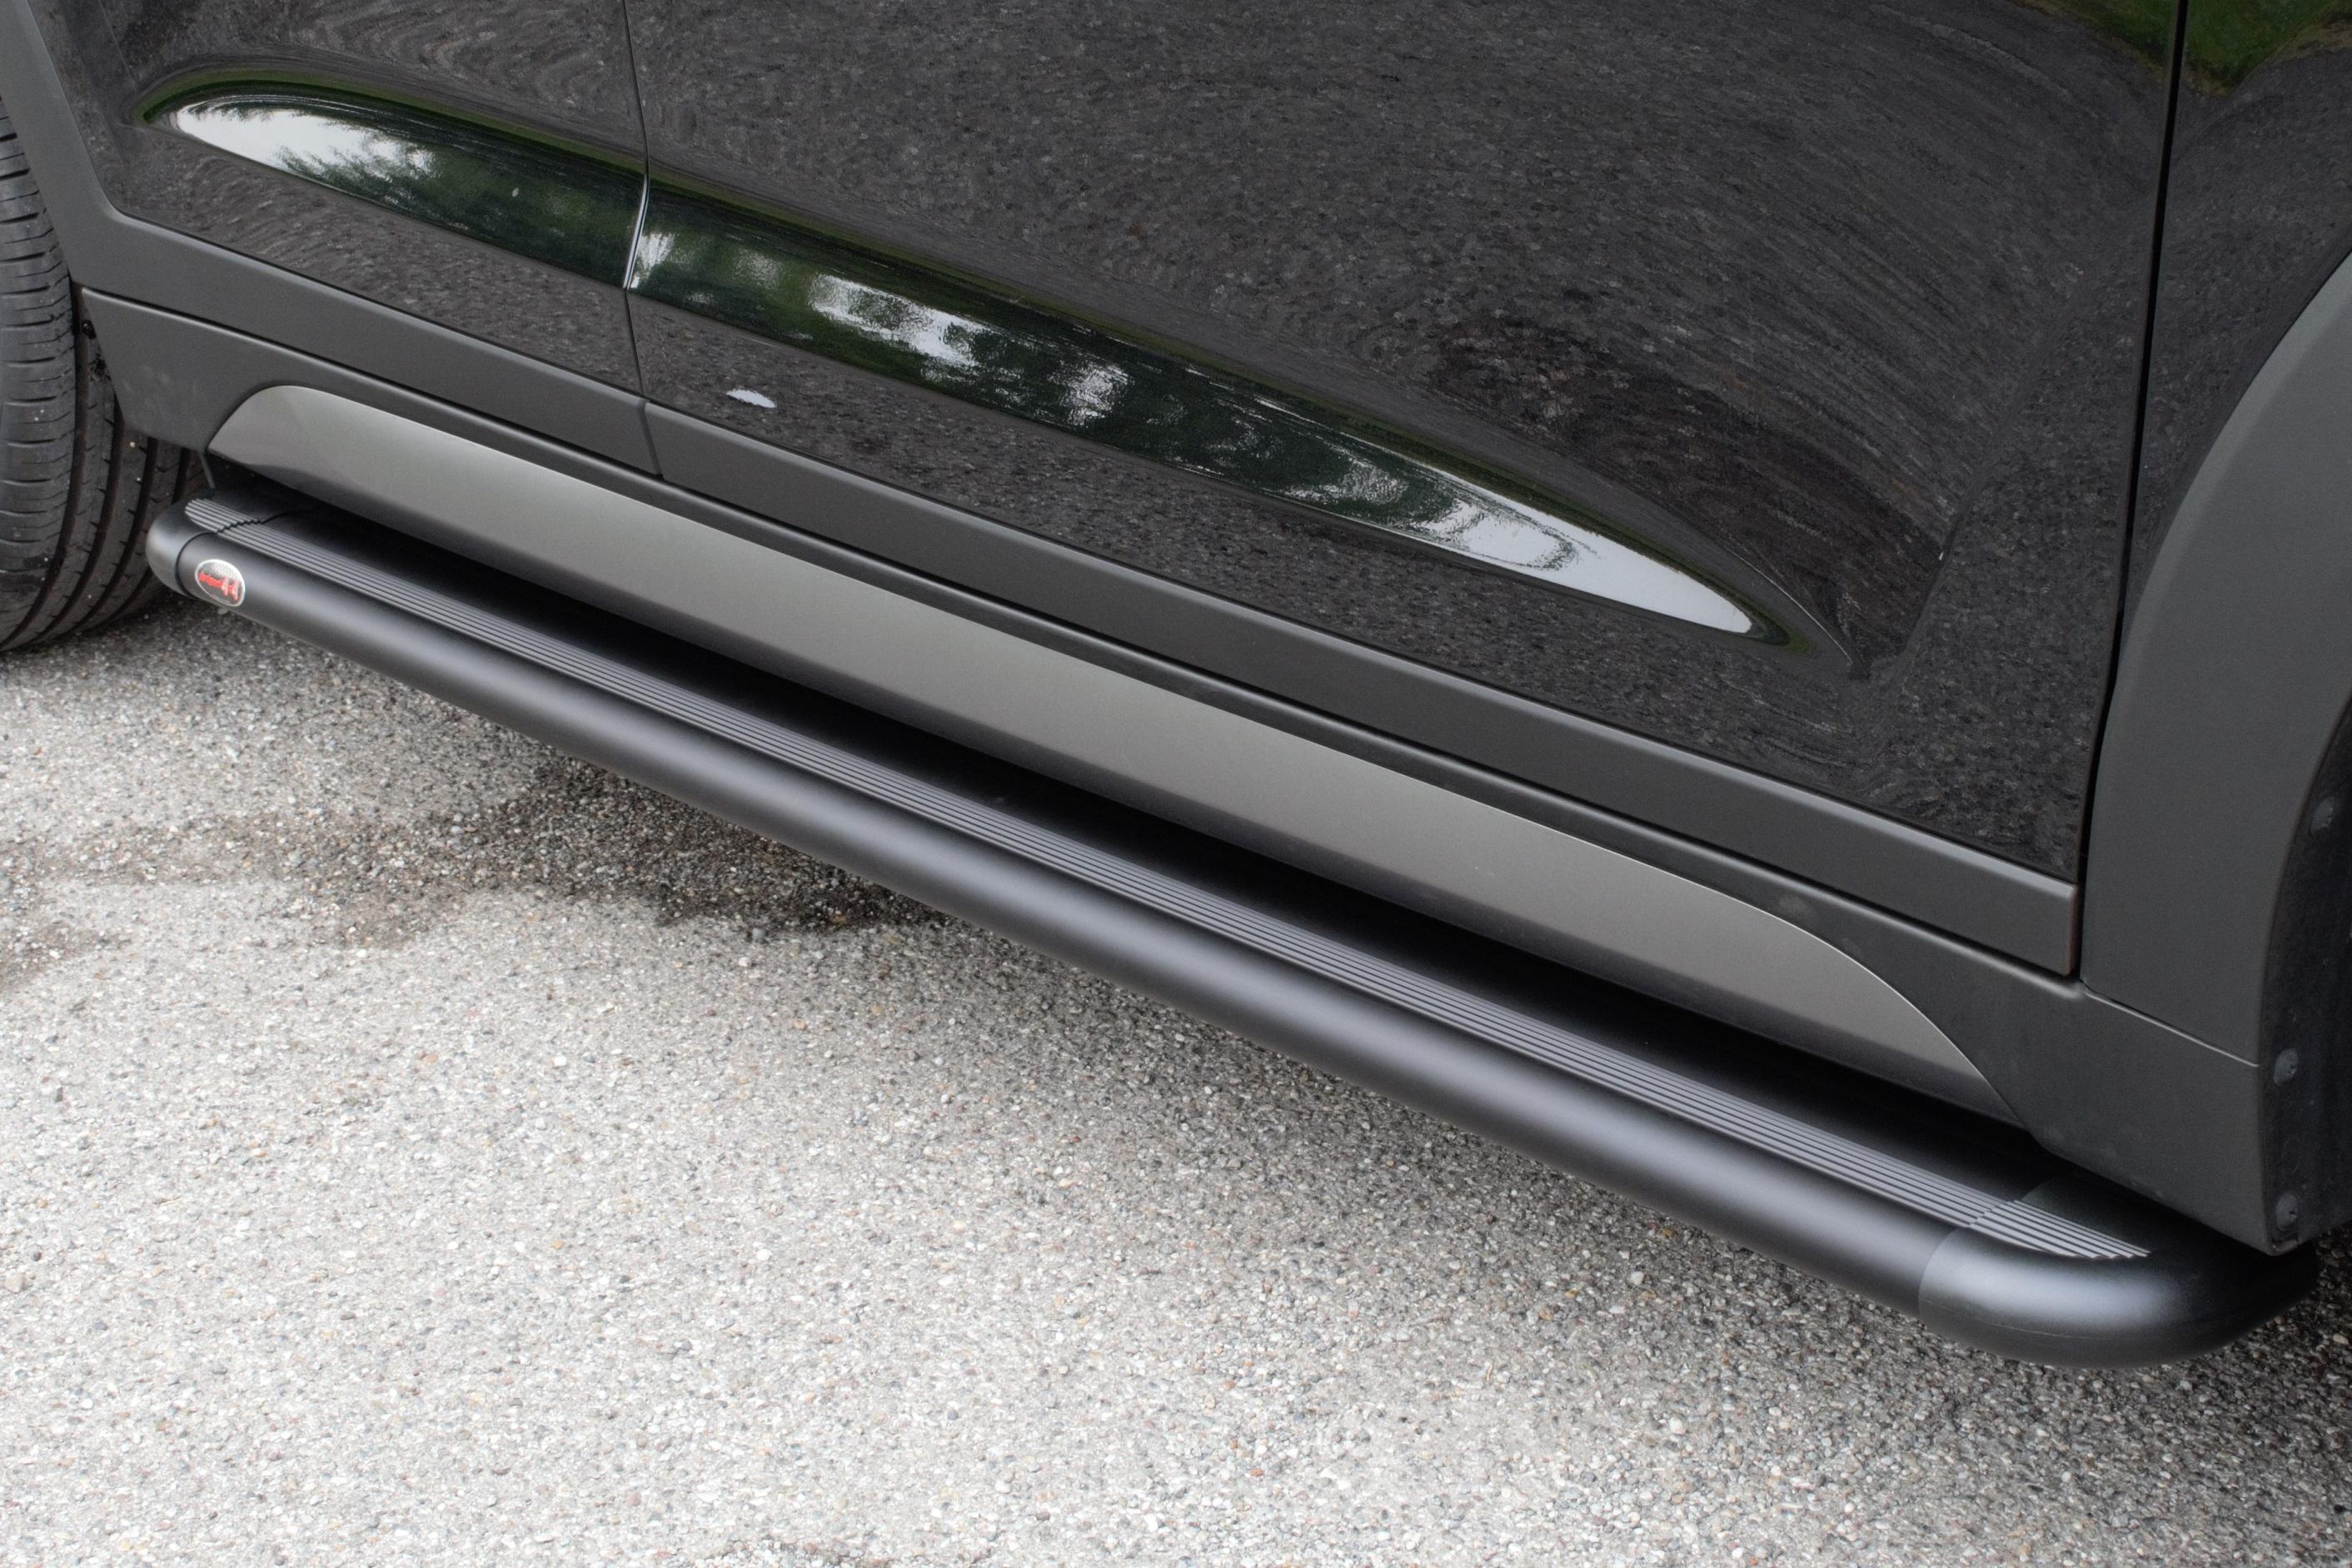 NOVISAuto Trittbretter Modell S50S-SKD